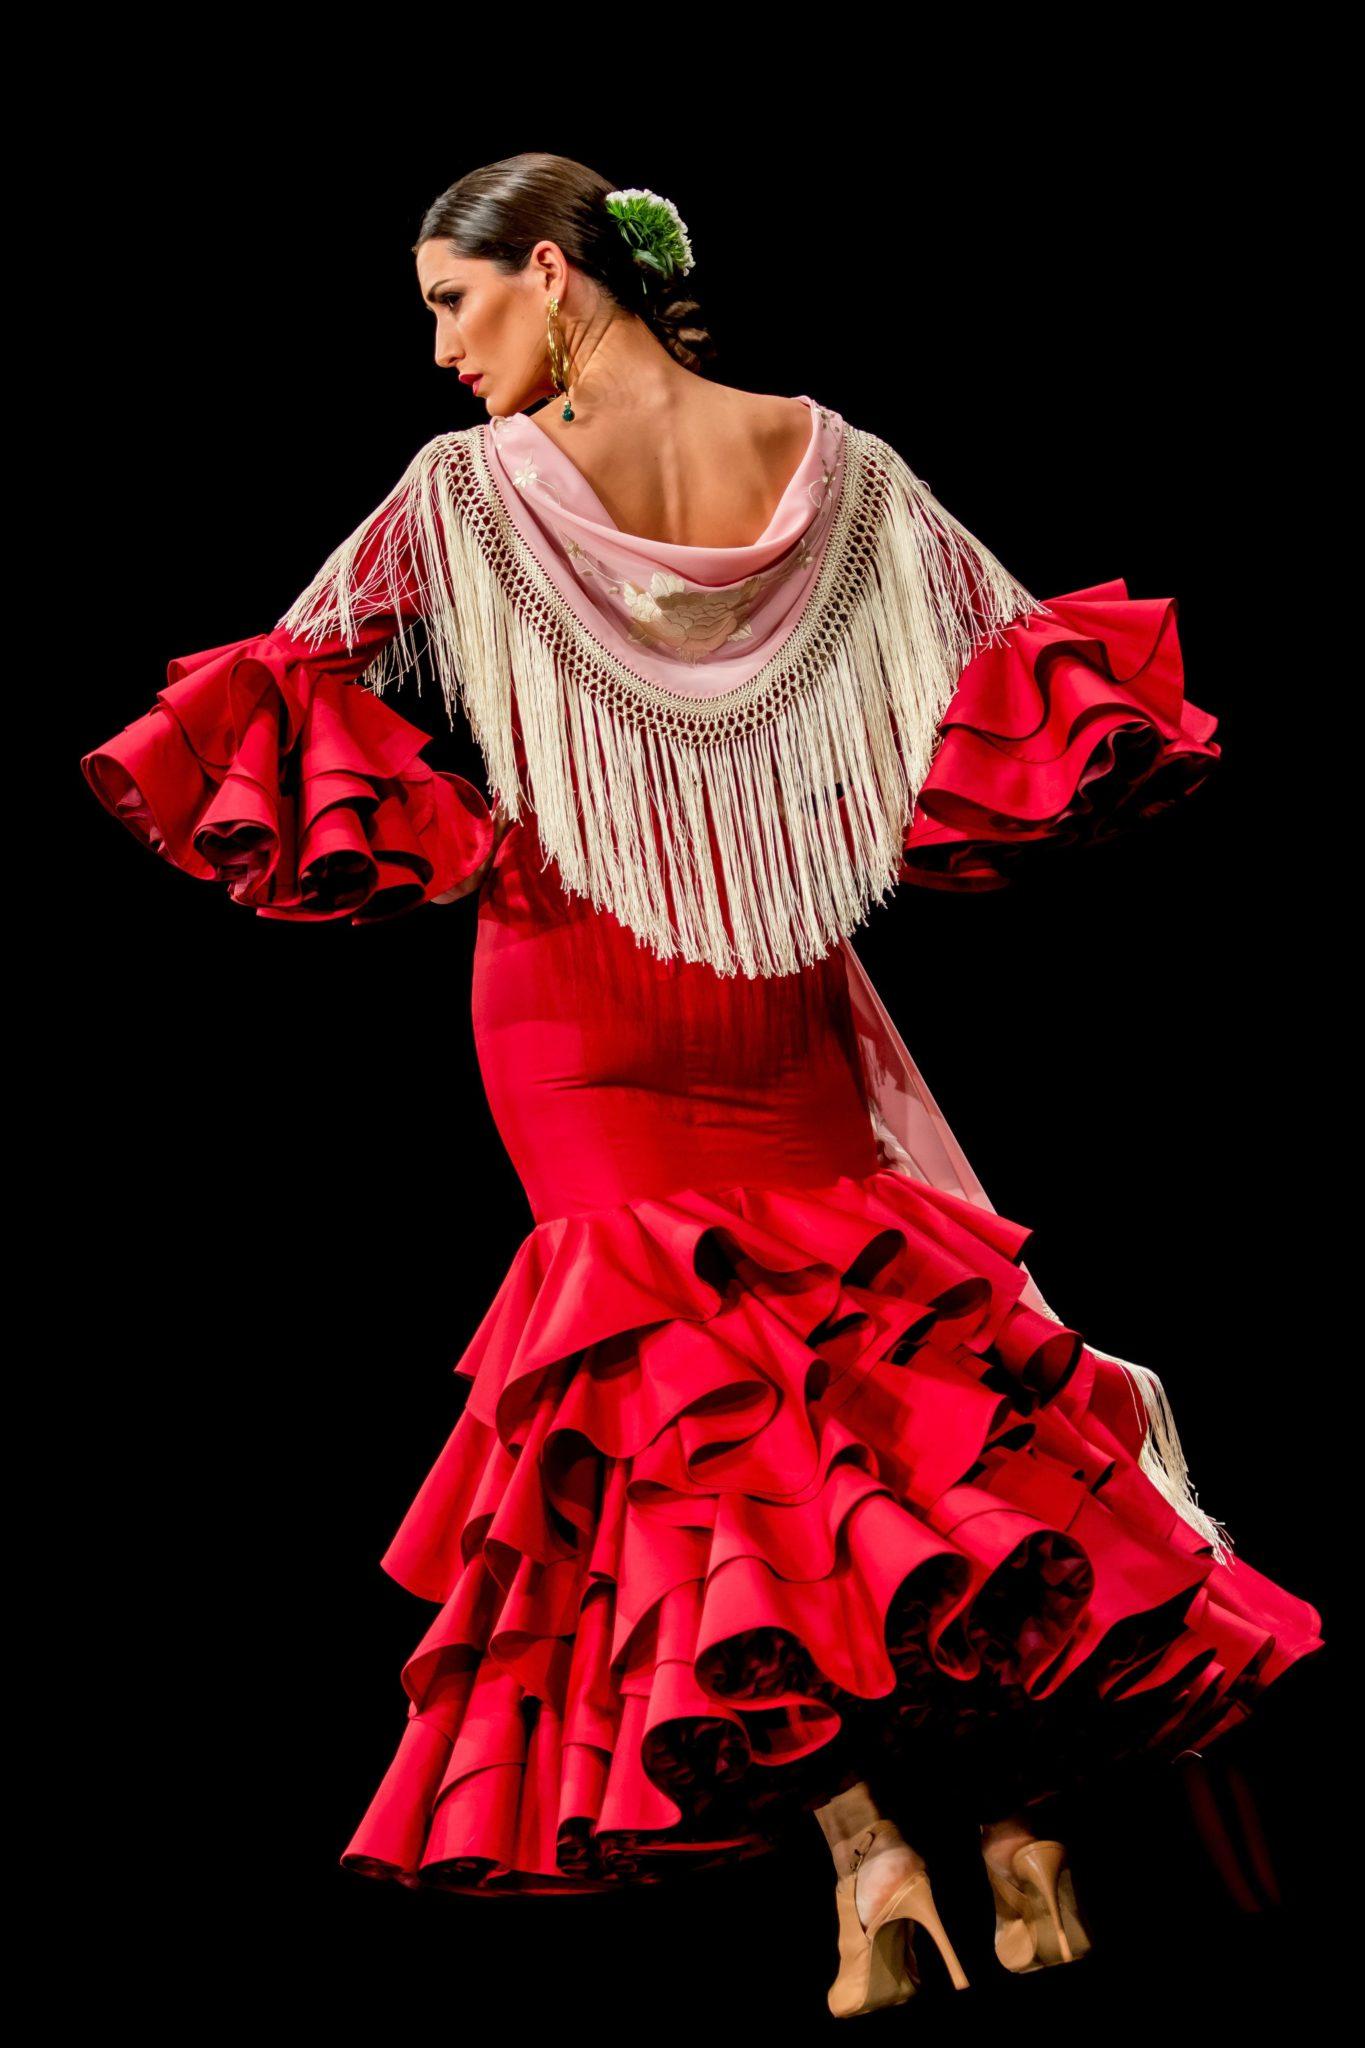 Hiszpania: Międzynarodowe Targi Mody Flamenco SIMOF w Sewilli, fot: Raul Caro, PAP/EPA